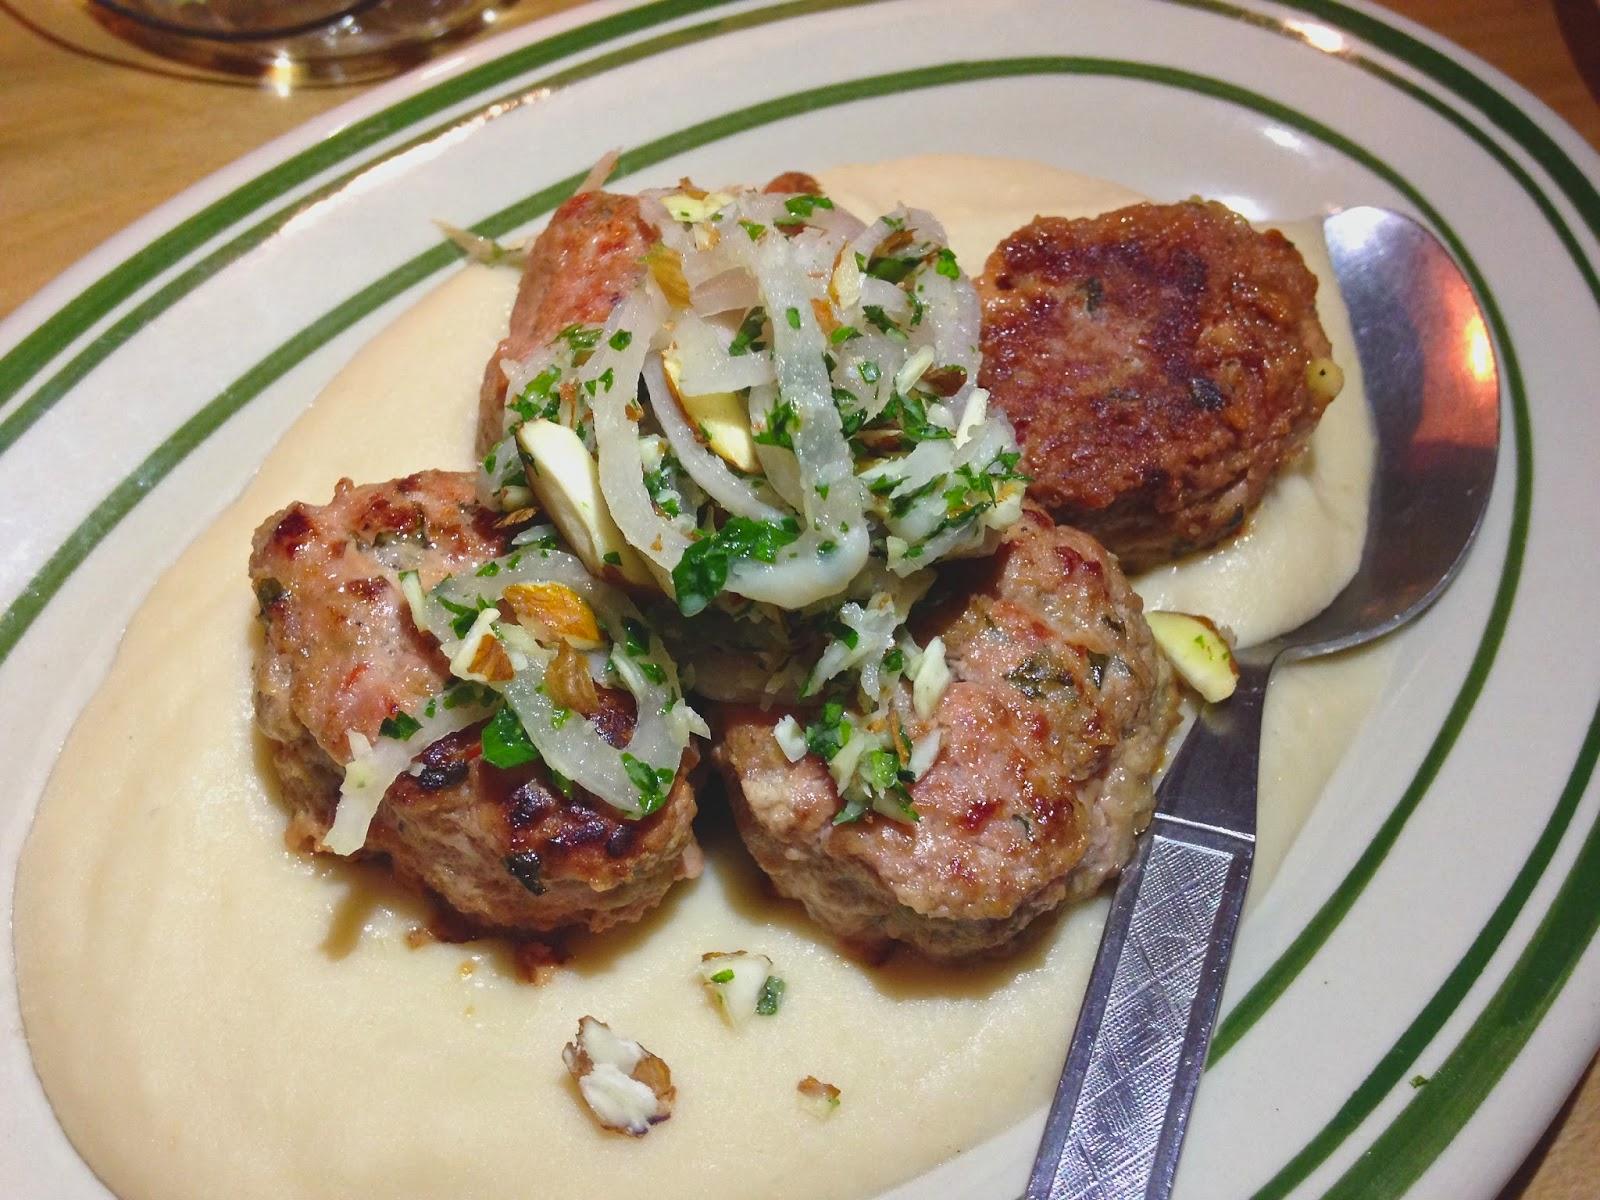 Albondigas: Pork & Veal Meatballs, White Bean Puree, Almonds